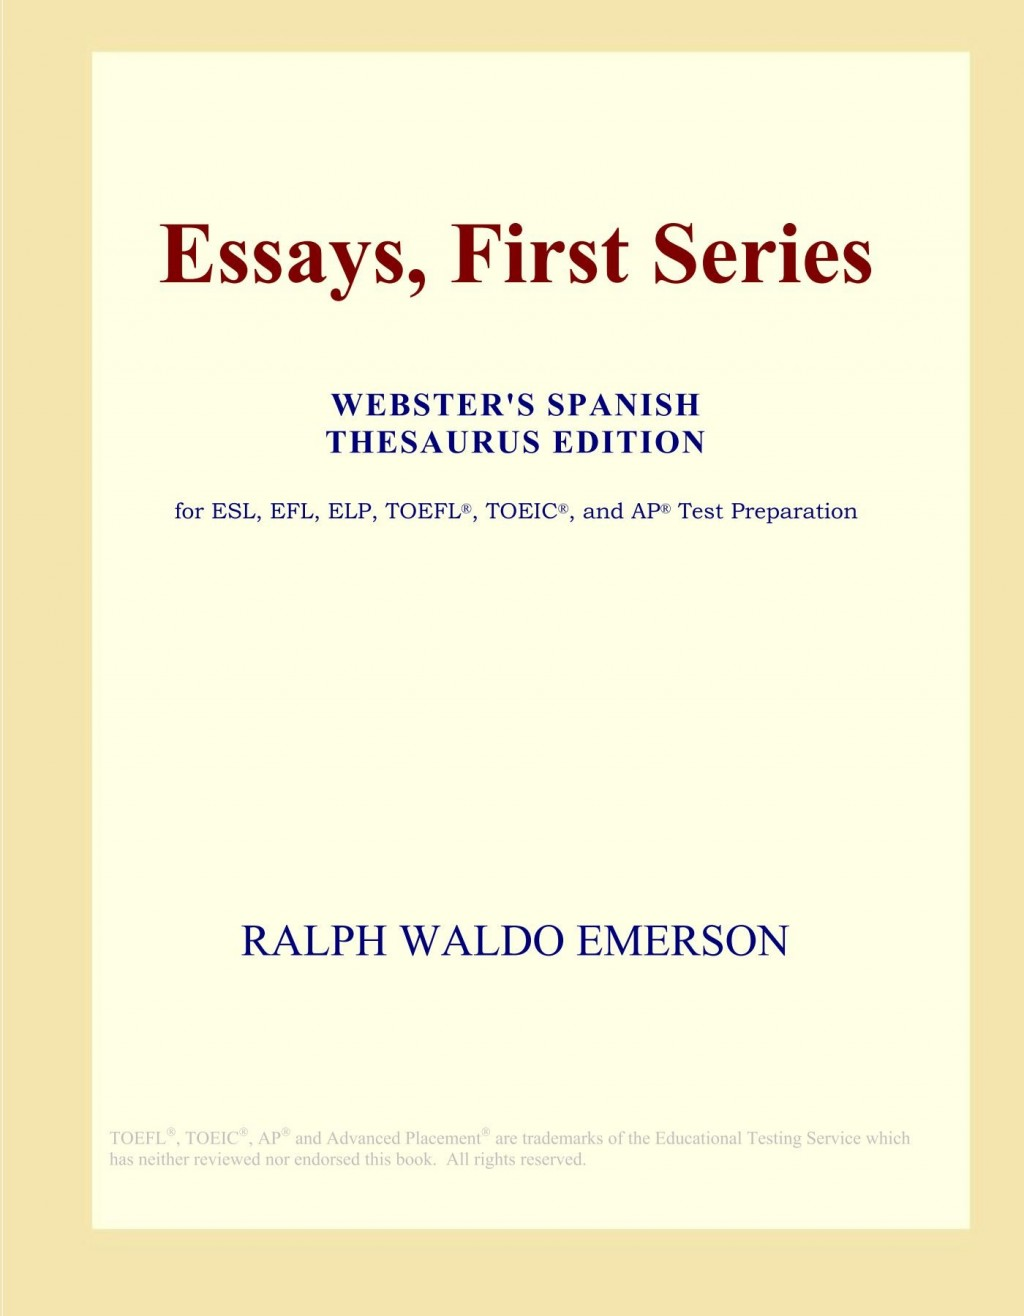 024 Essay Example 61cjxhnthzl Essays First Stunning Series Emerson Pdf Shelburne Publisher Large